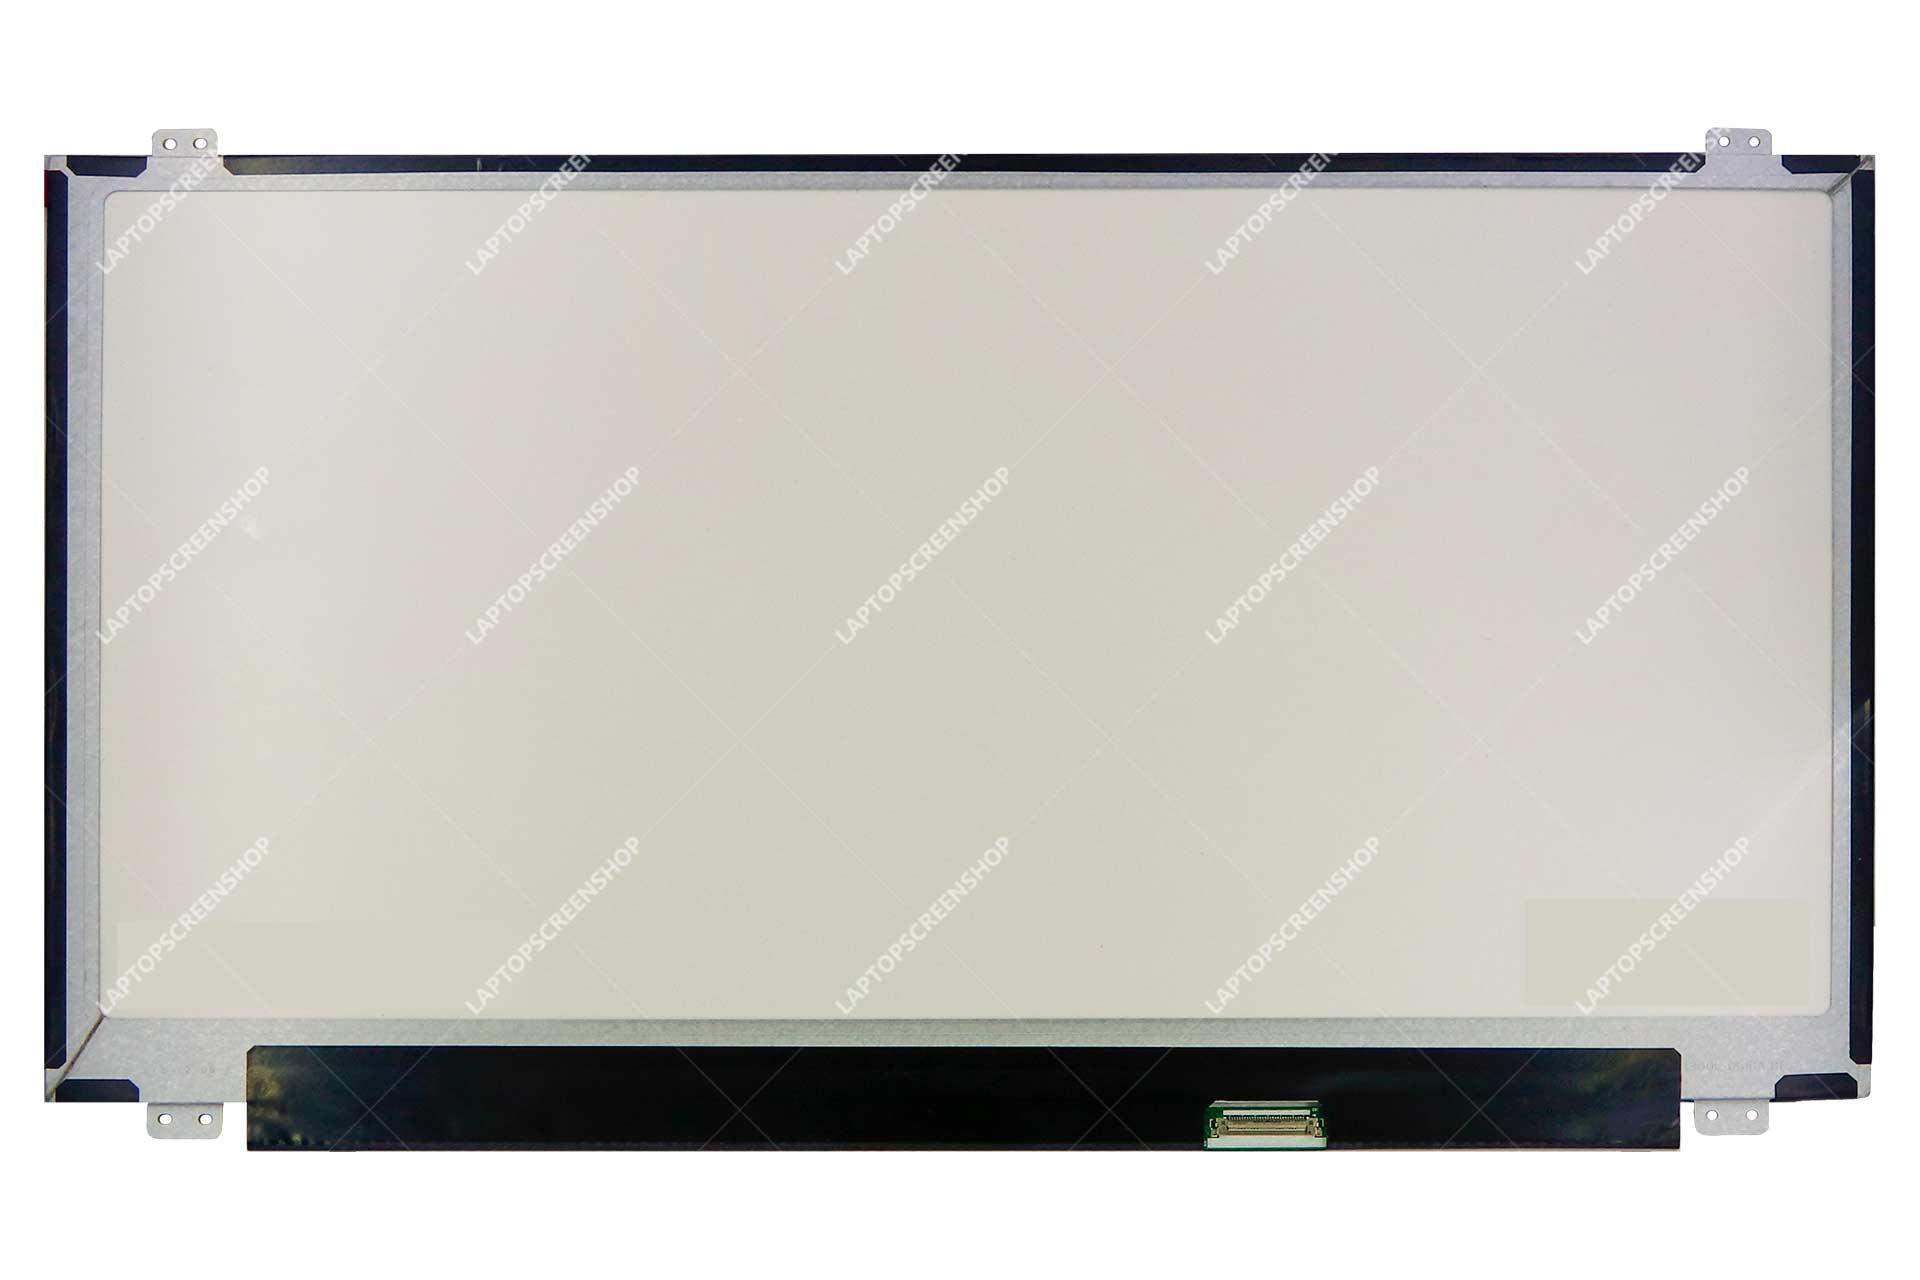 ASUS-VIVOBOOK-PRO-N552VX-FI-SERIES-LCD  UHD فروشگاه لپ تاپ اسکرين   تعمير لپ تاپ